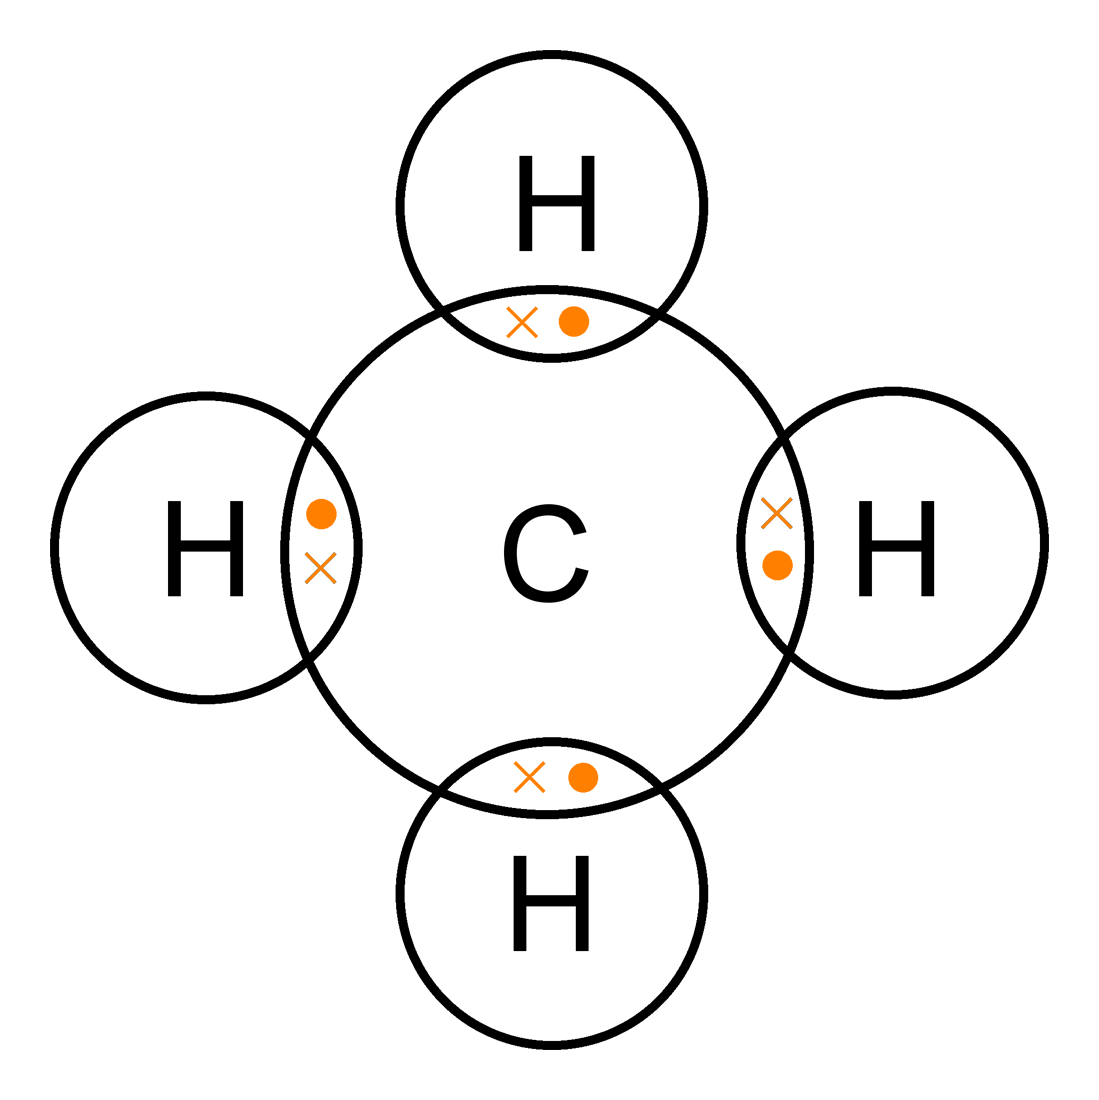 Pusat Sumber Belajar Kimia Ikatan Kovalen